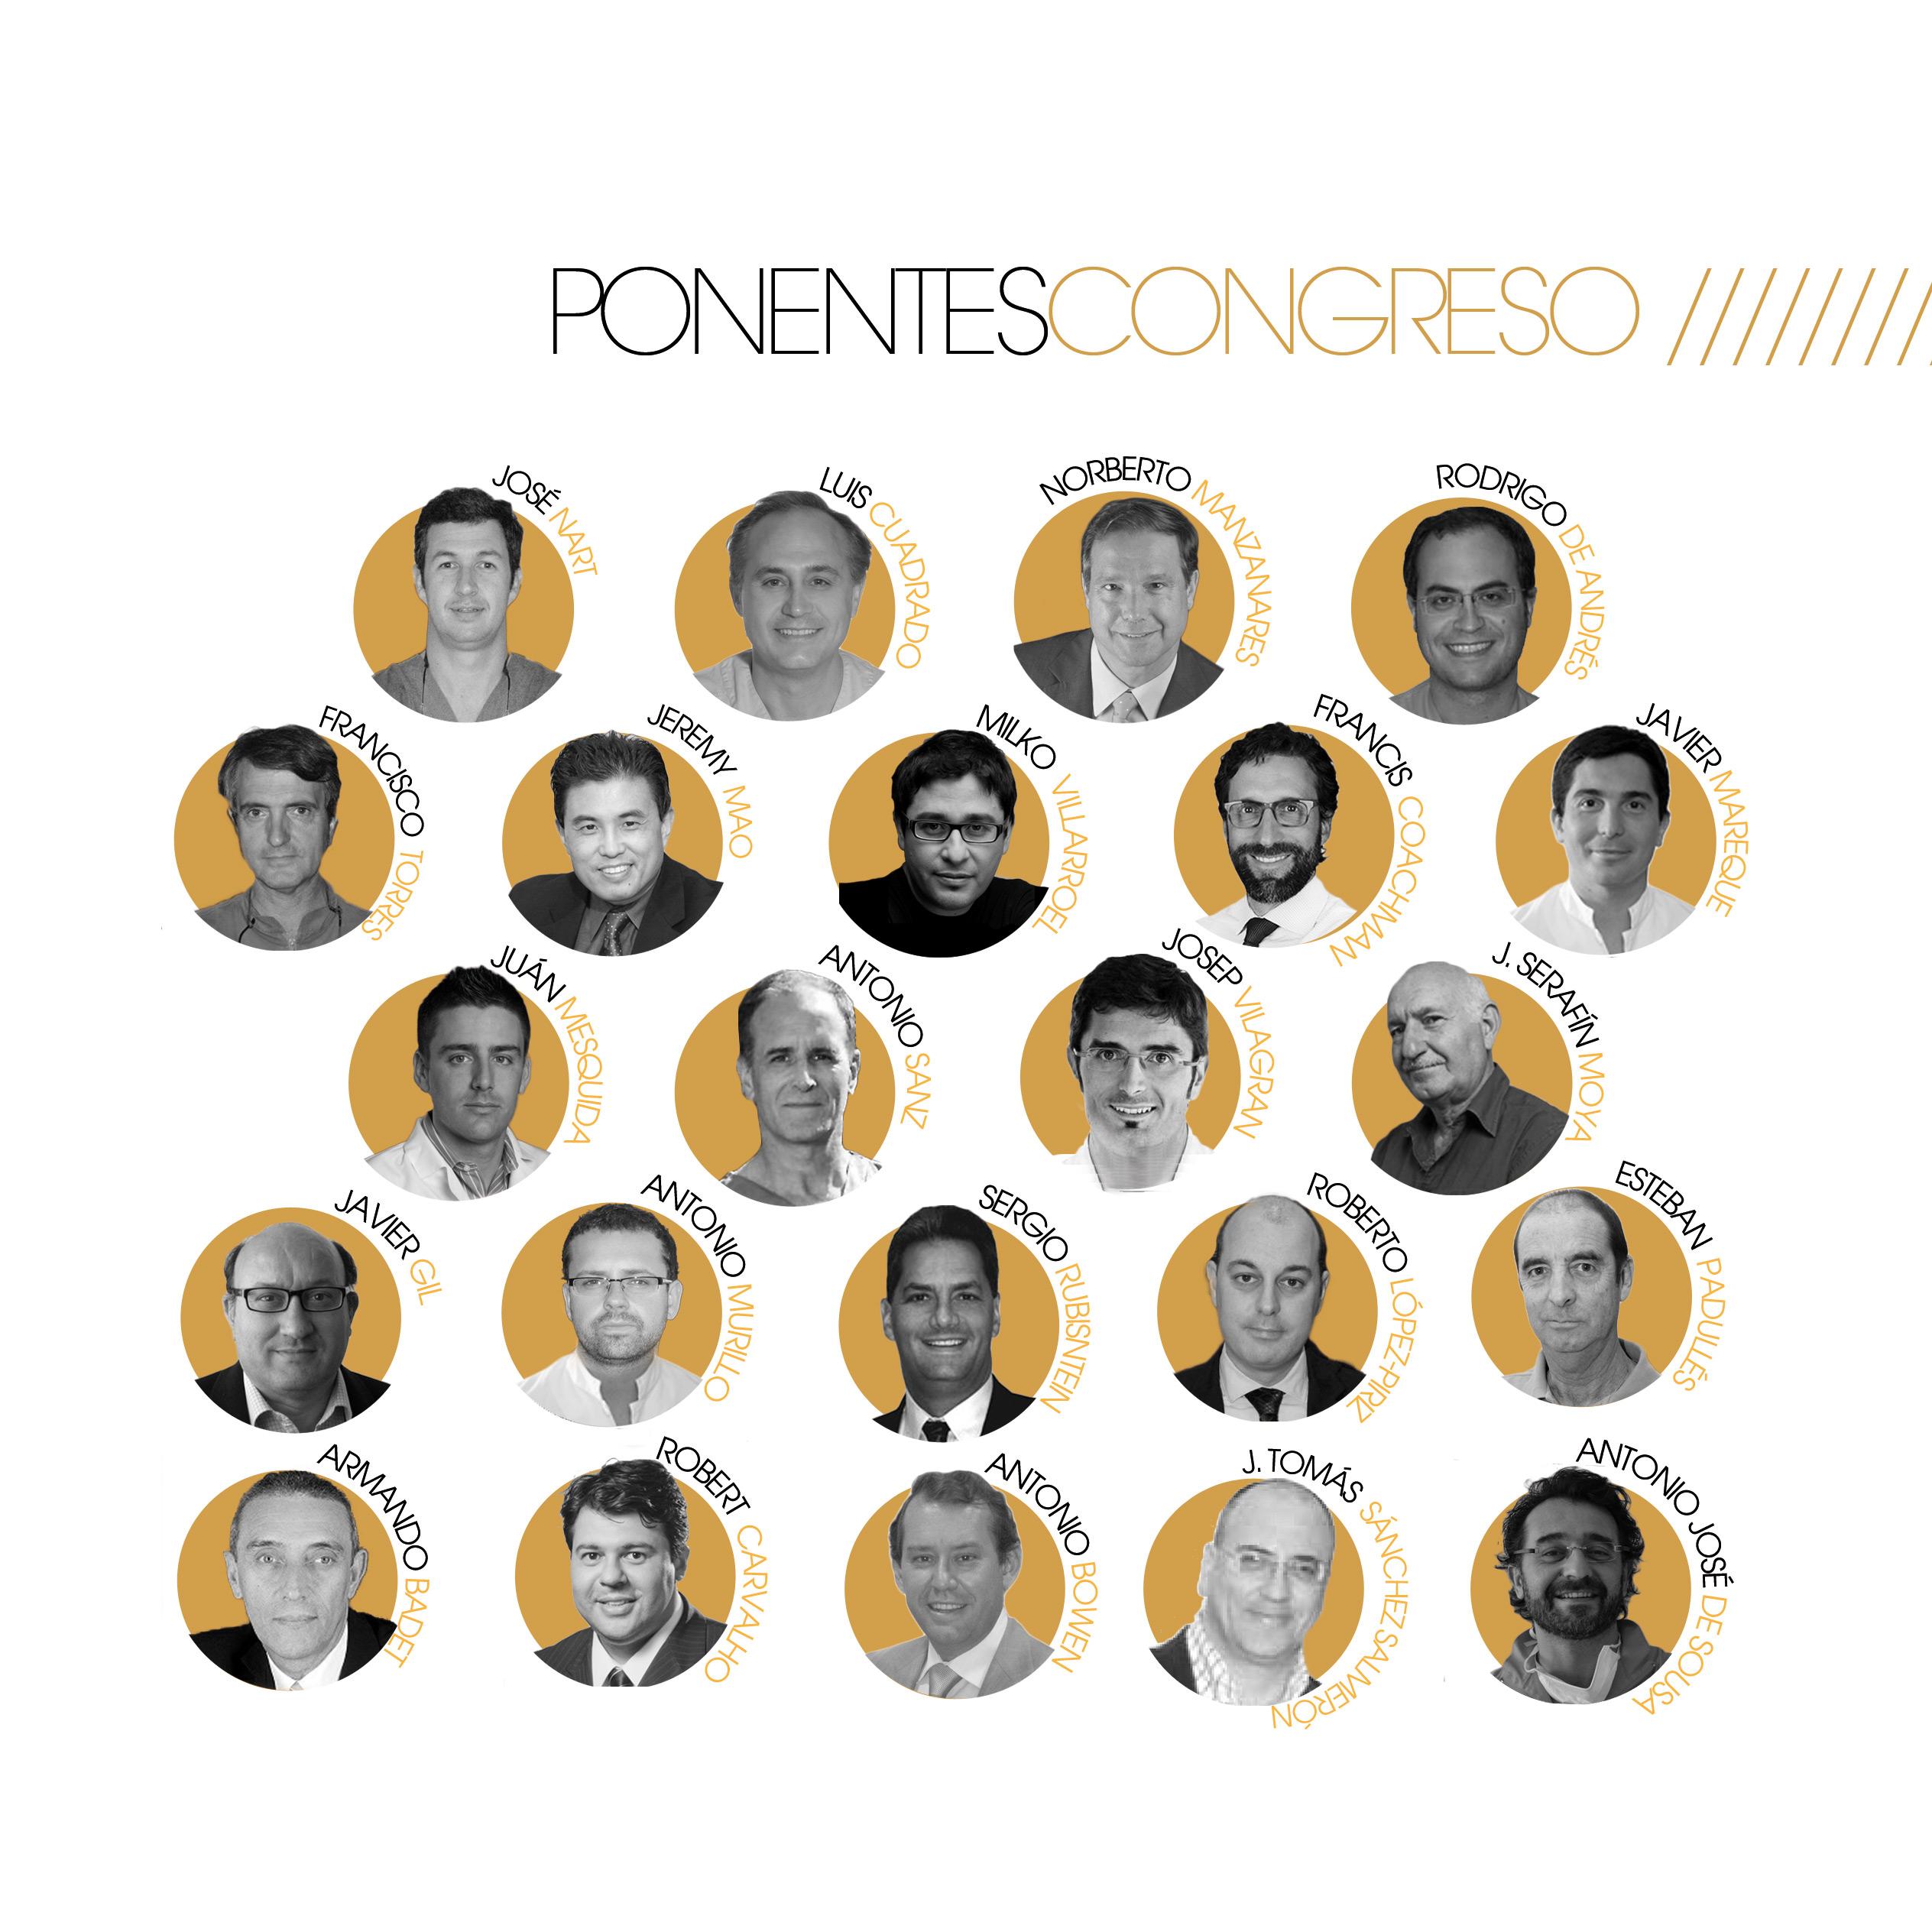 Ponentes XXVII Congreso Nacional & XX Congreso Internacional Sociedad Española de Implantes SEI 2014